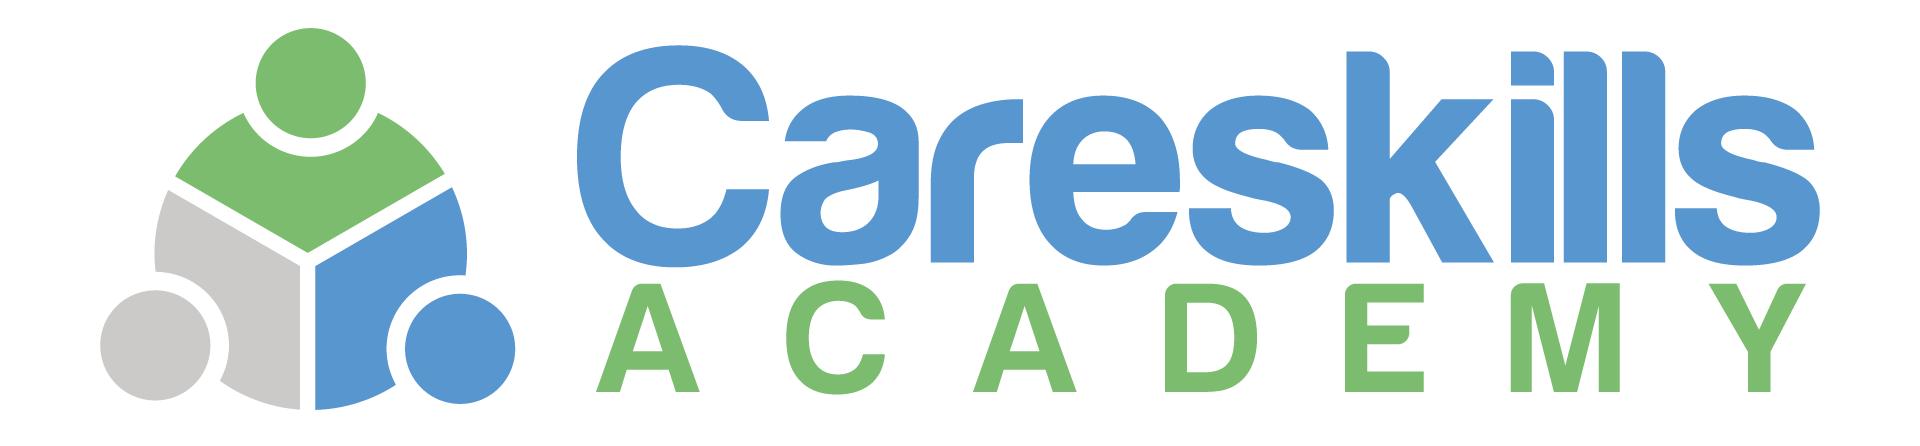 careskillsacademy-logo